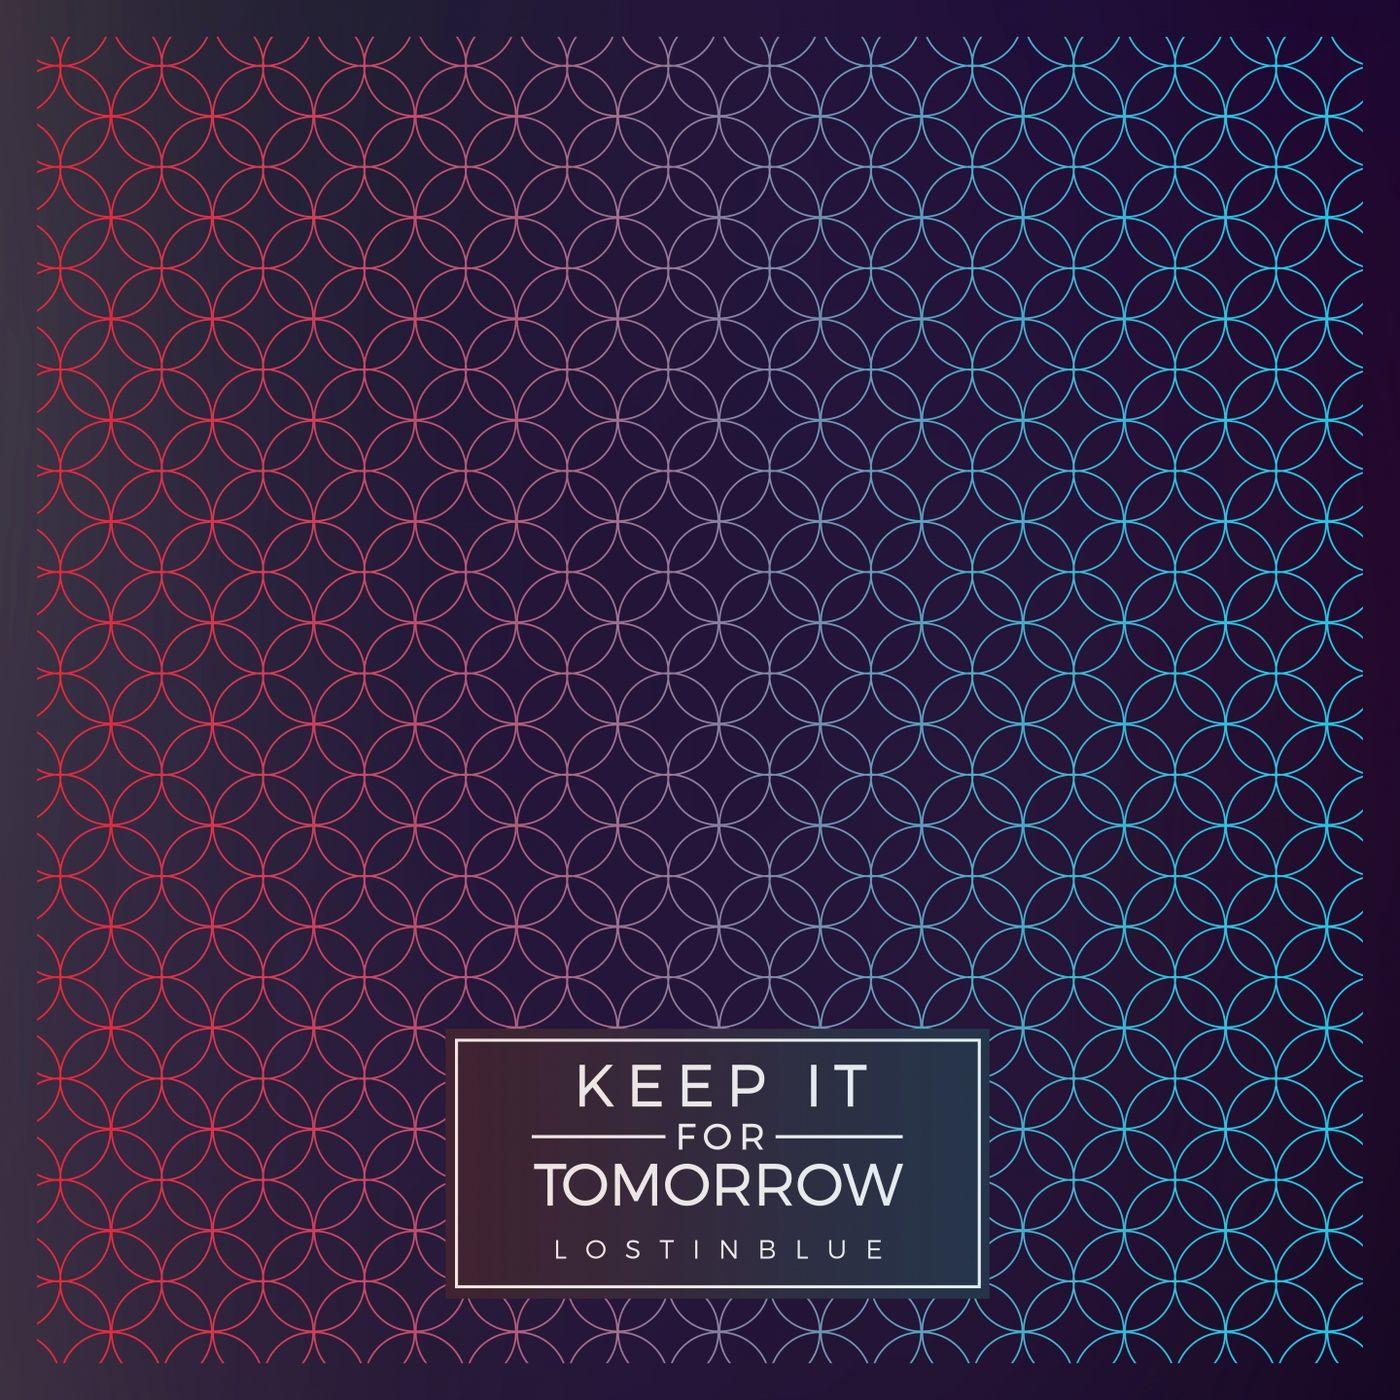 Keep It for Tomorrow - lostinblue [single] (2016)